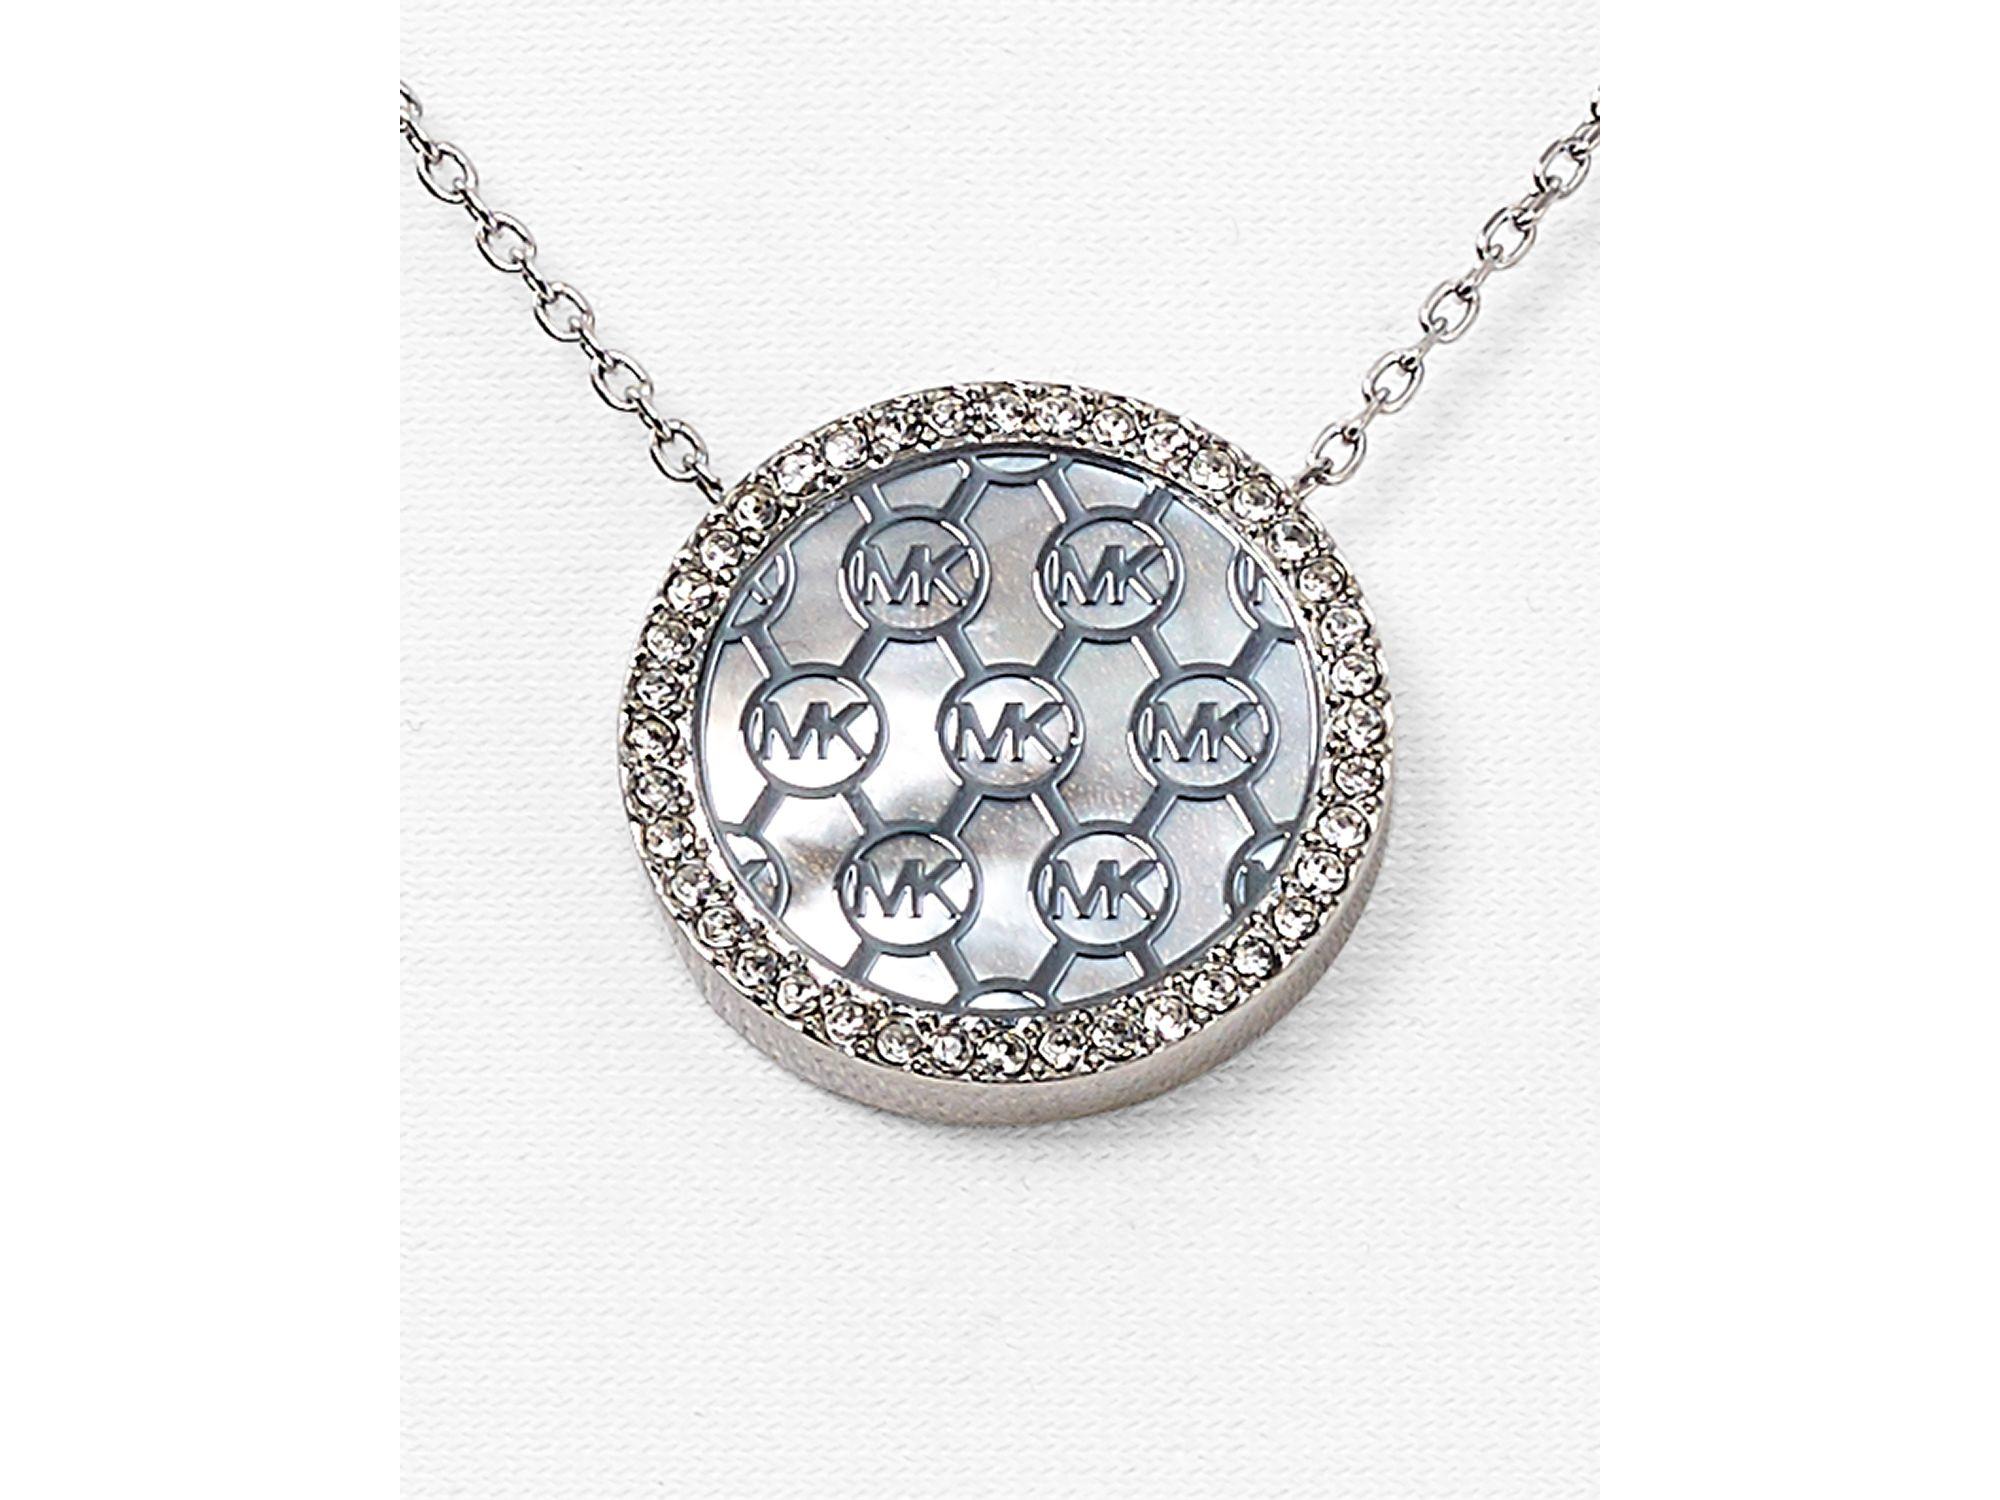 Michael kors monogram pendant necklace 16 in metallic lyst gallery aloadofball Gallery